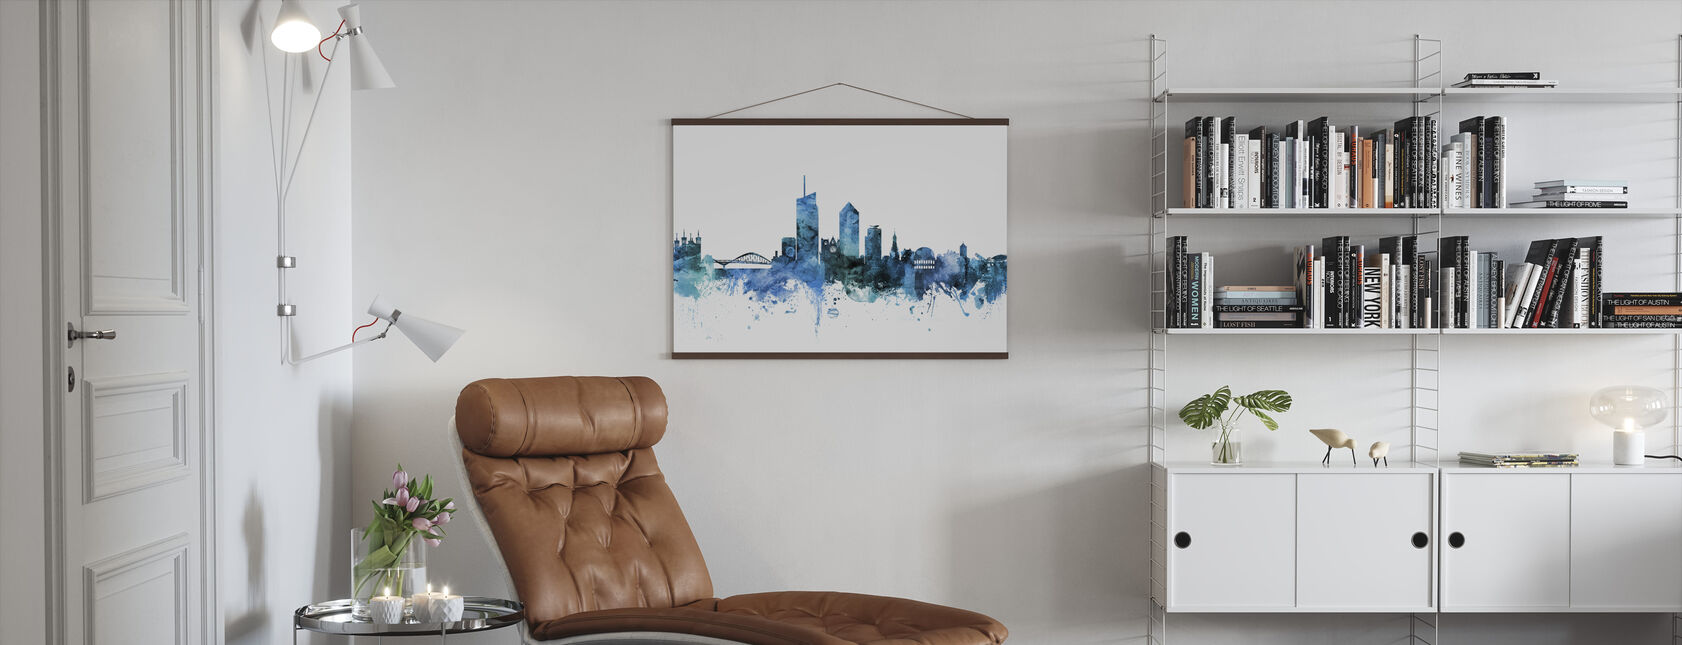 Lyon France Skyline - Affiche - Salle à manger